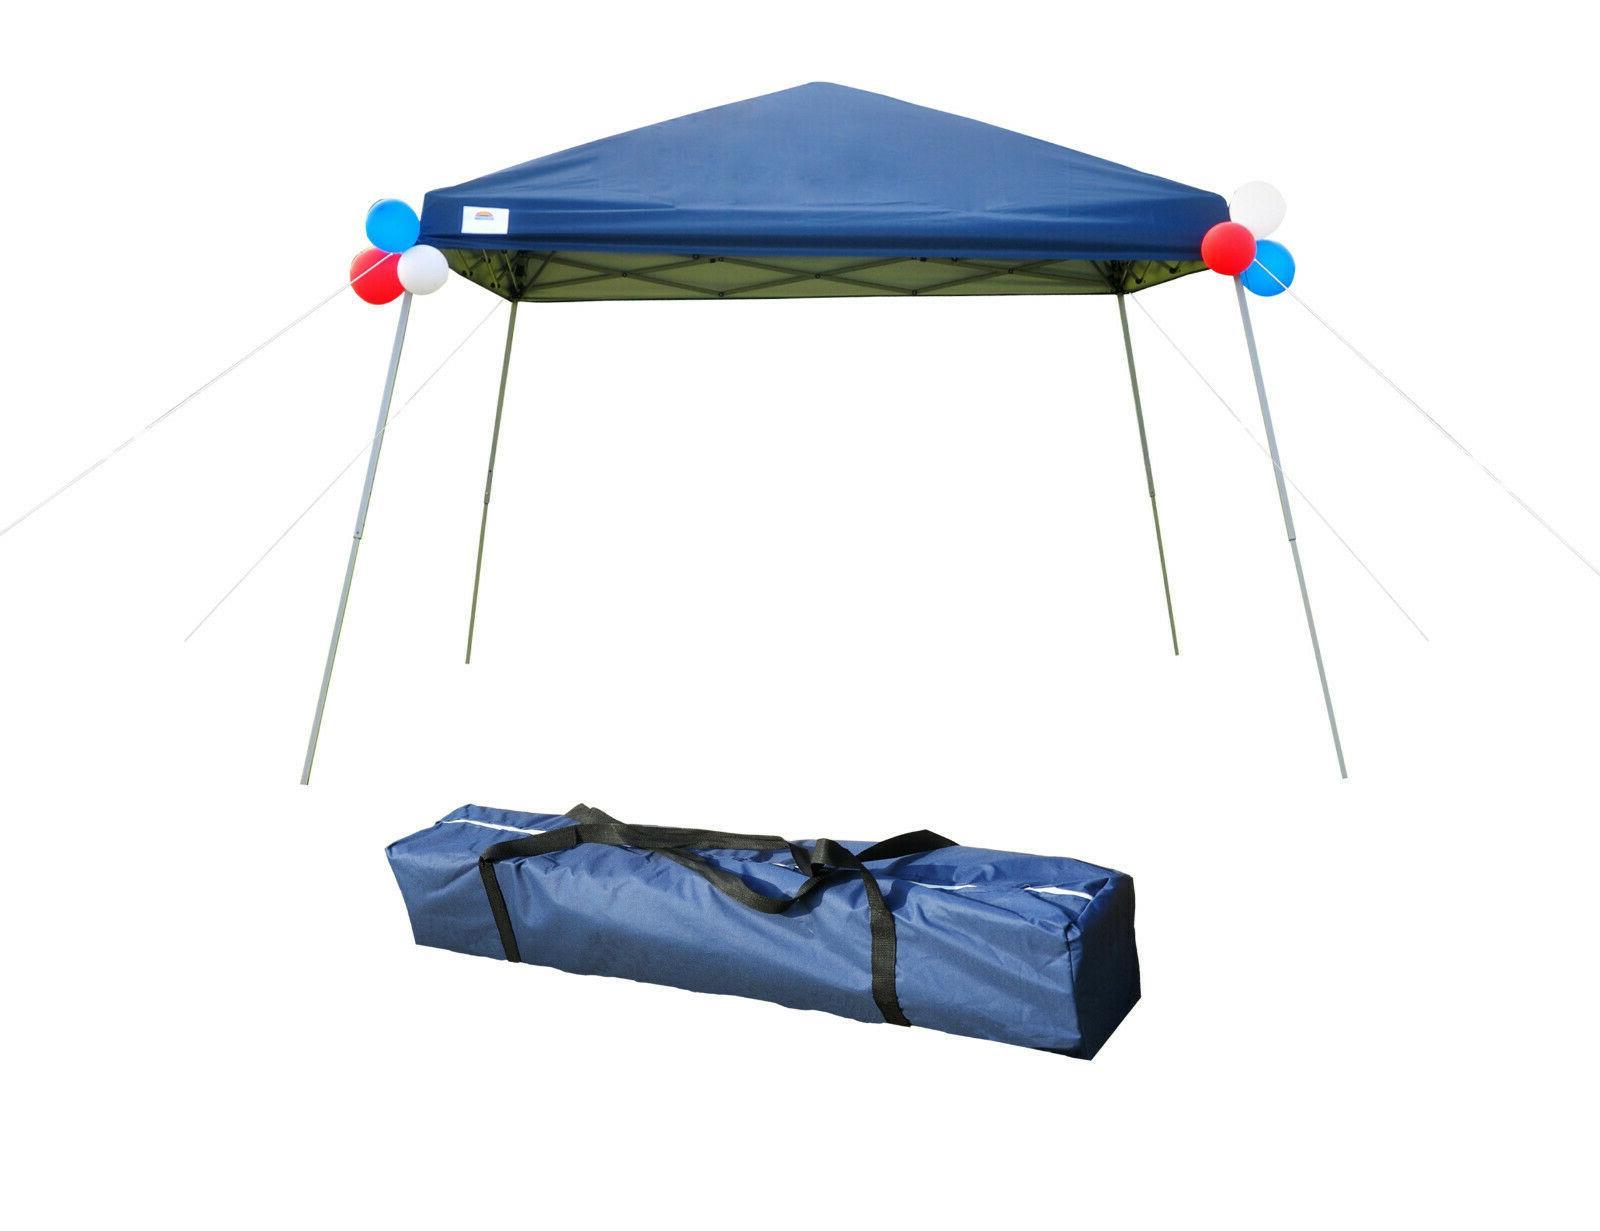 10x10 Heavy Duty Canopy EZ Pop Up Canopy Wedding Party Tent